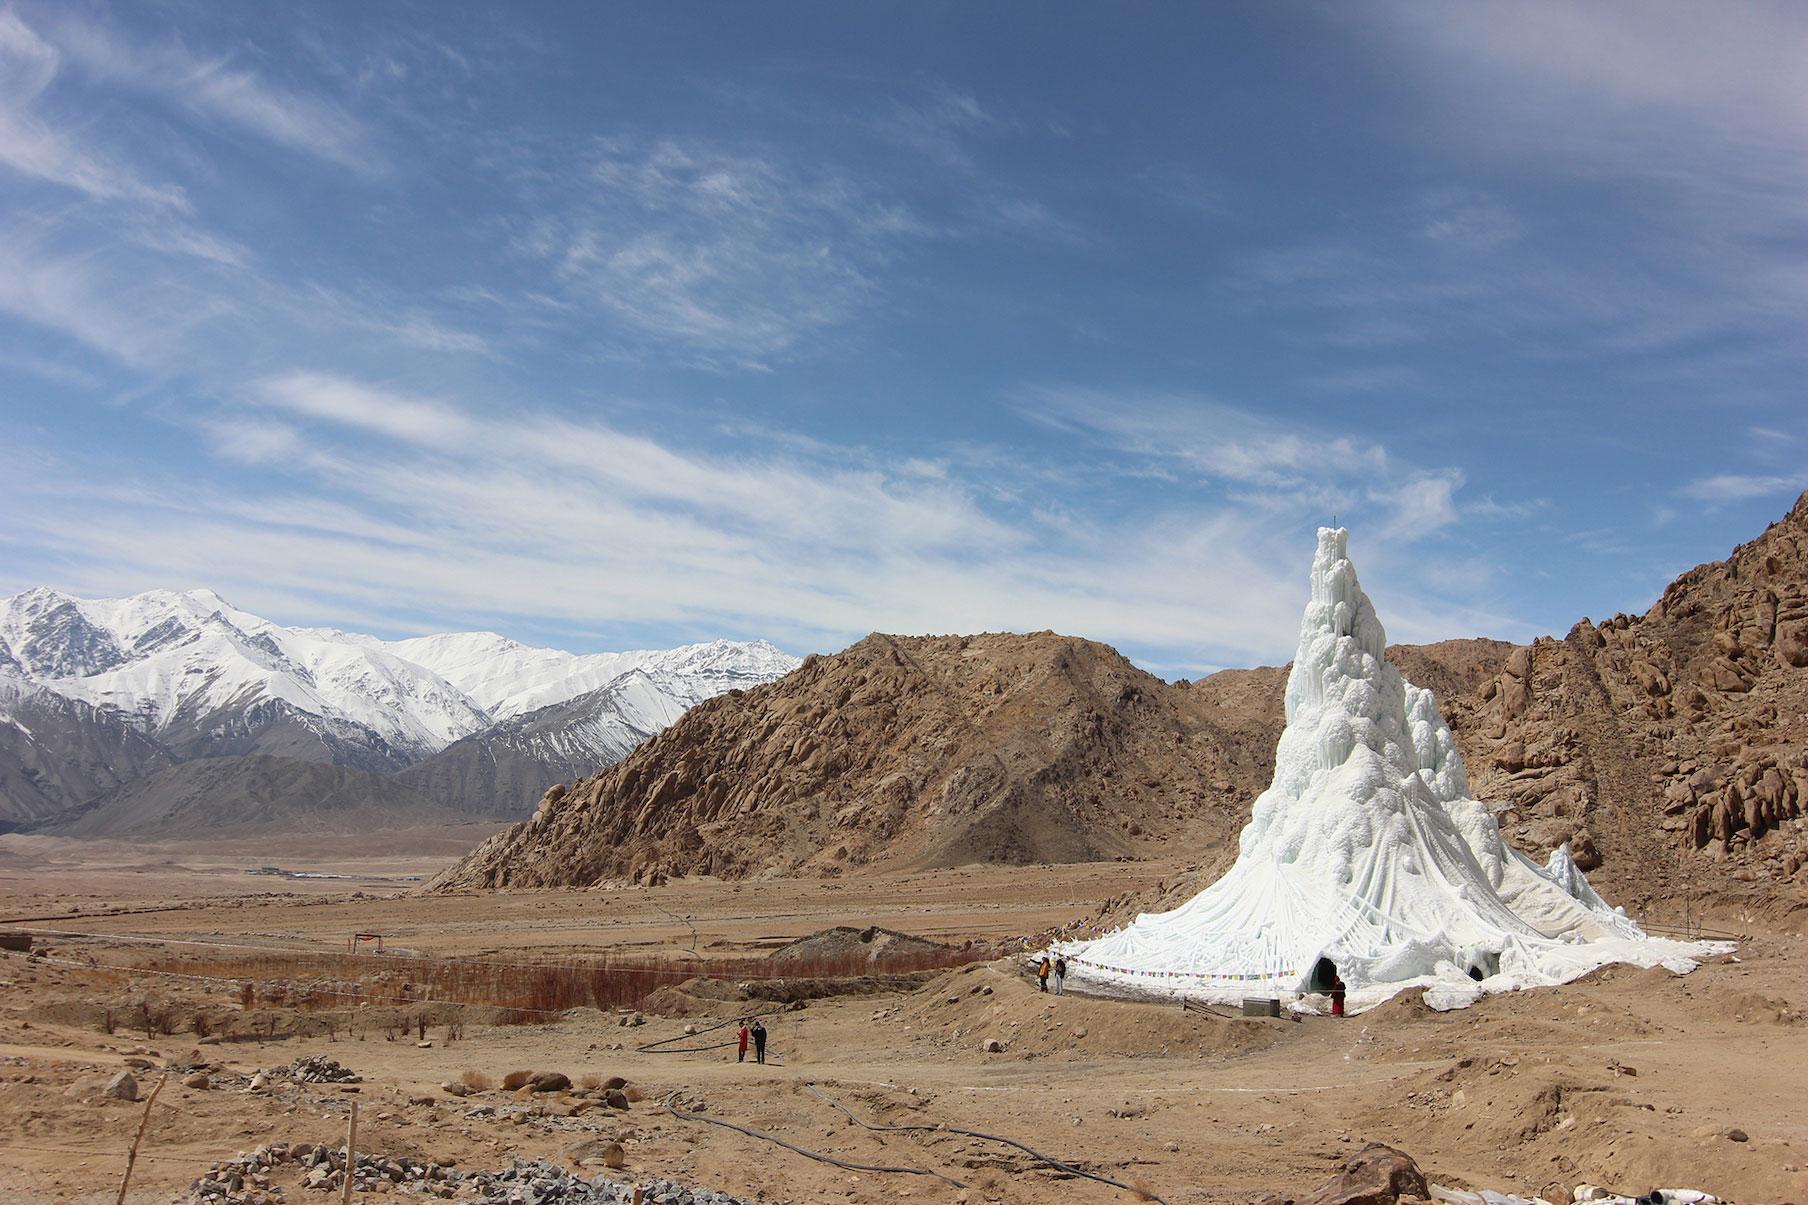 Ice Stupa Sonam Wangchuk, Sonam Dorje e Simant Verm